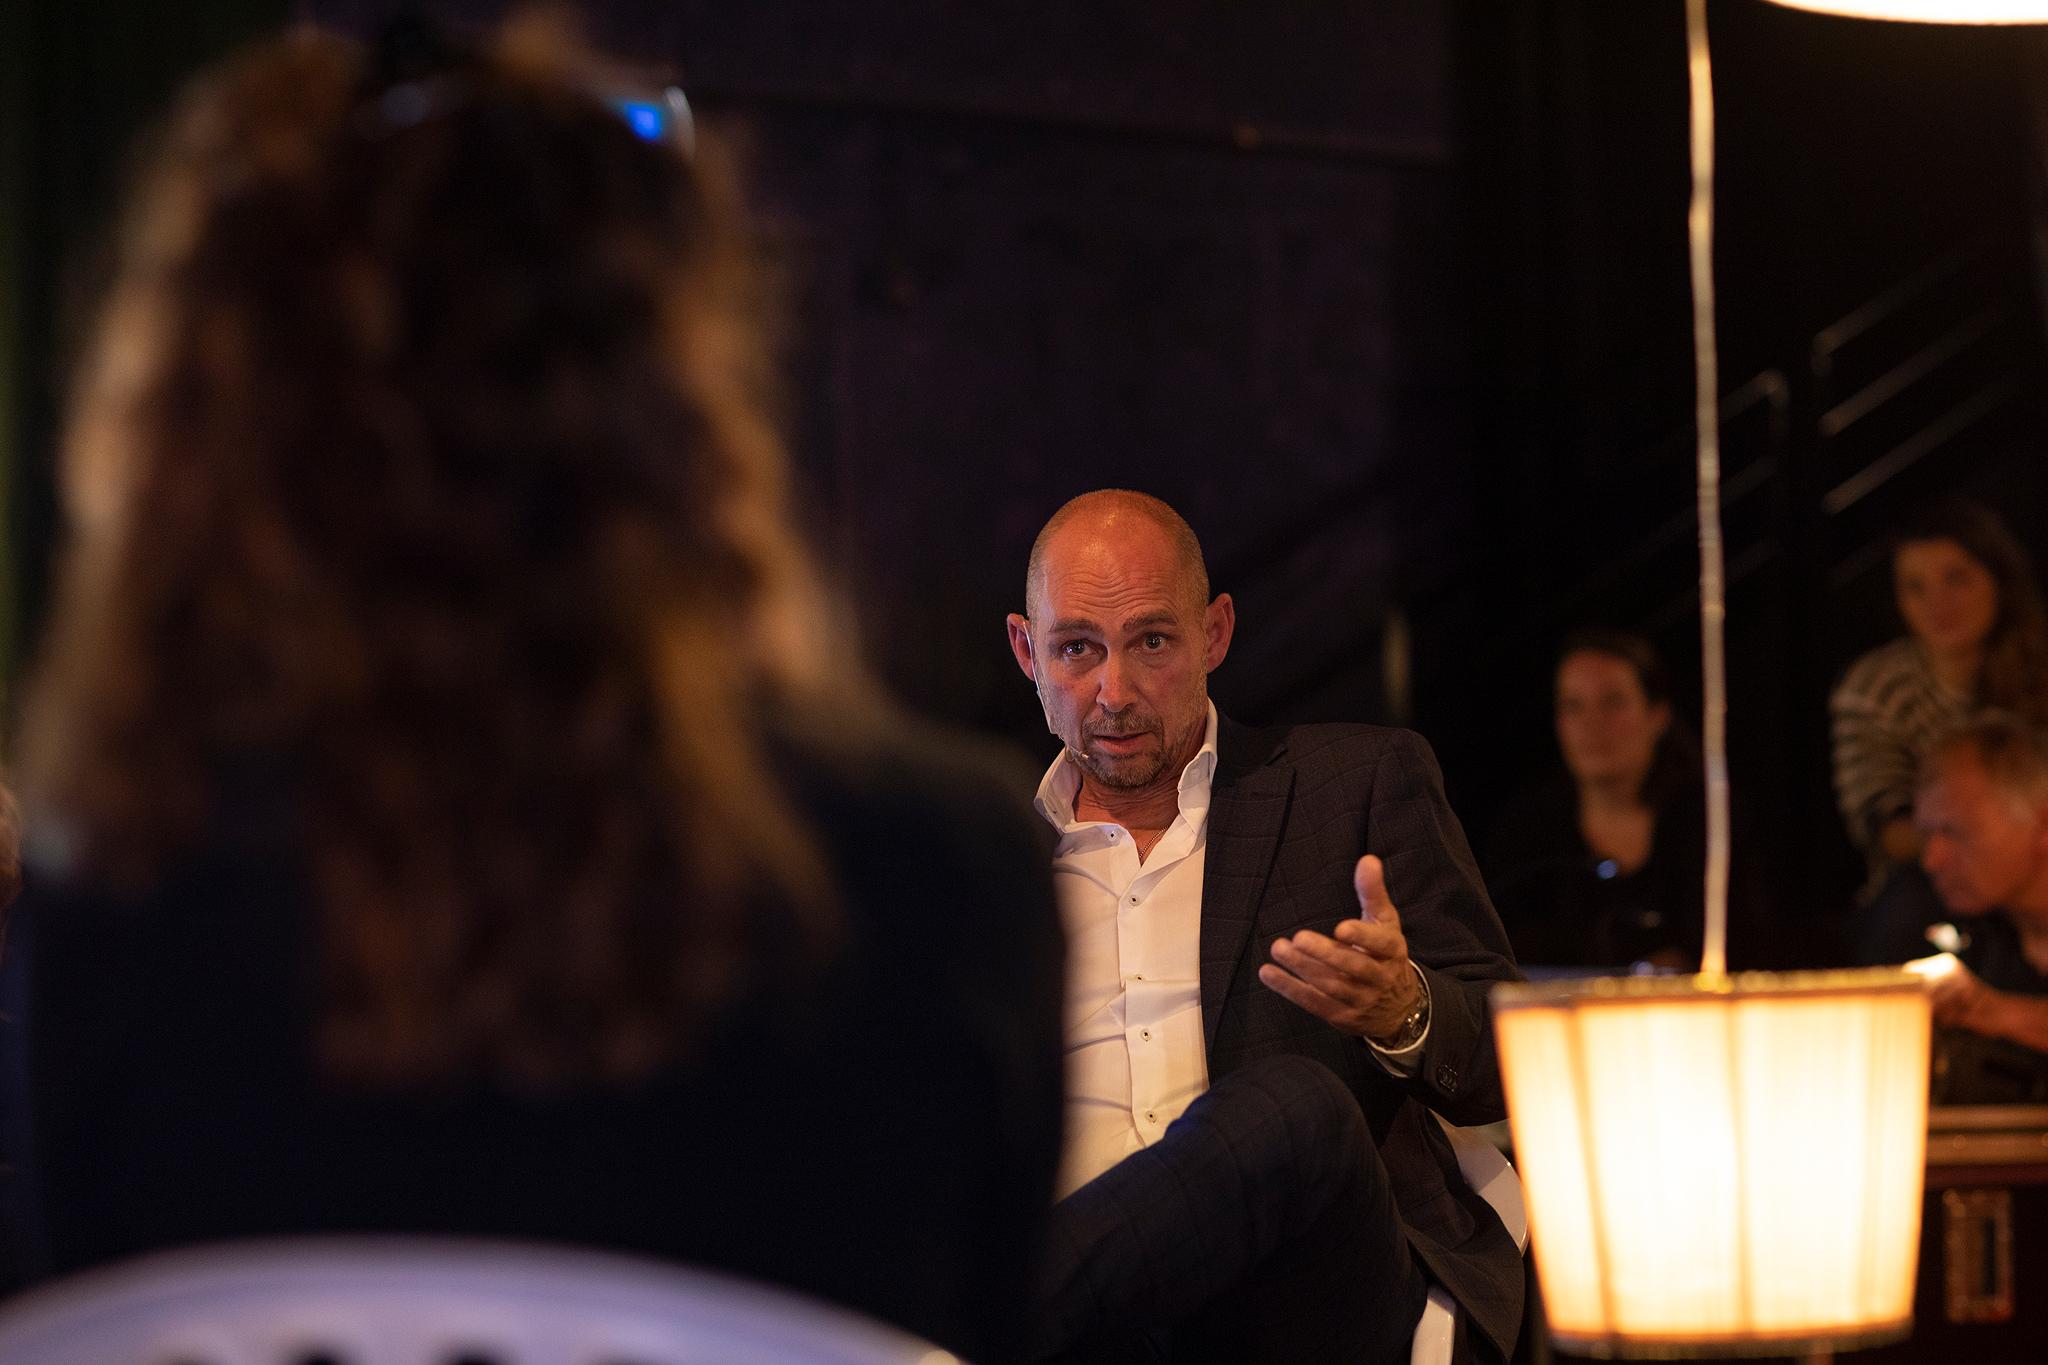 Verslag Salon Eindhoven: glorie